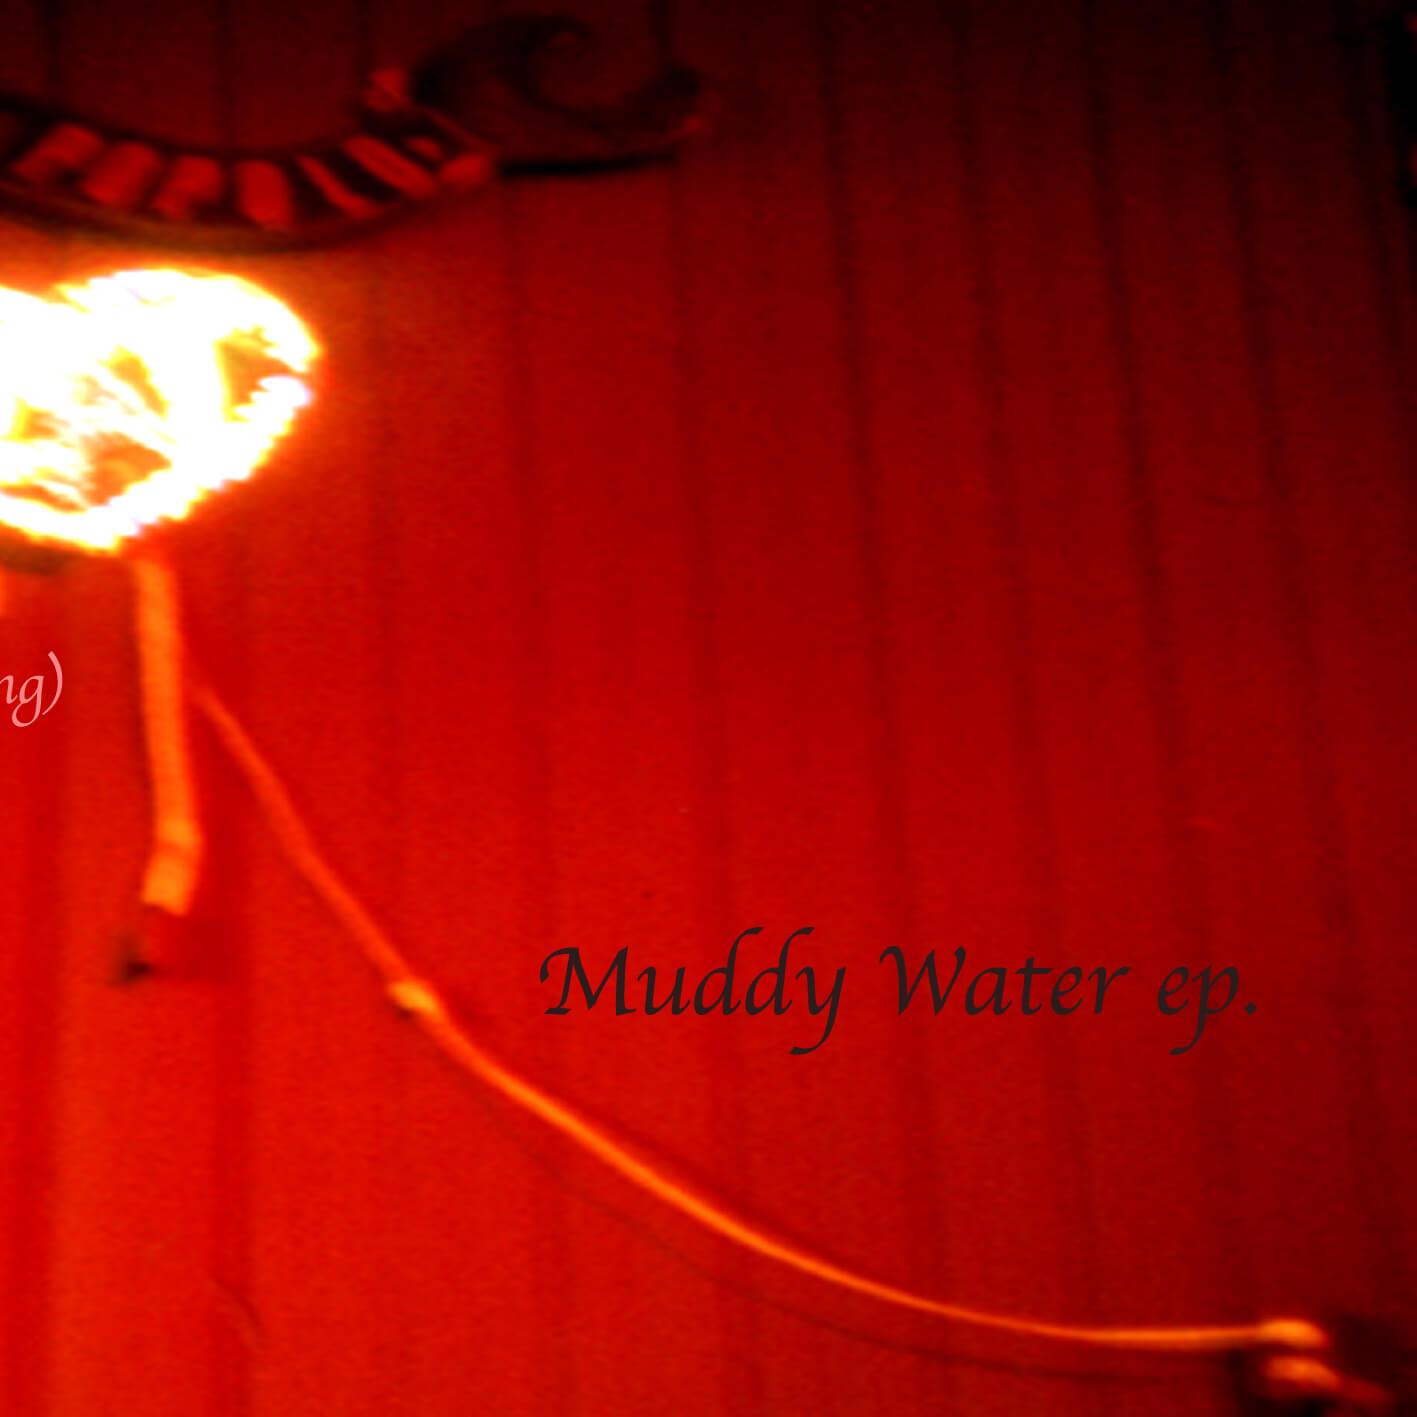 NEOTROPIC_Muddy_Water_EP_PinkLizardMusic_medium